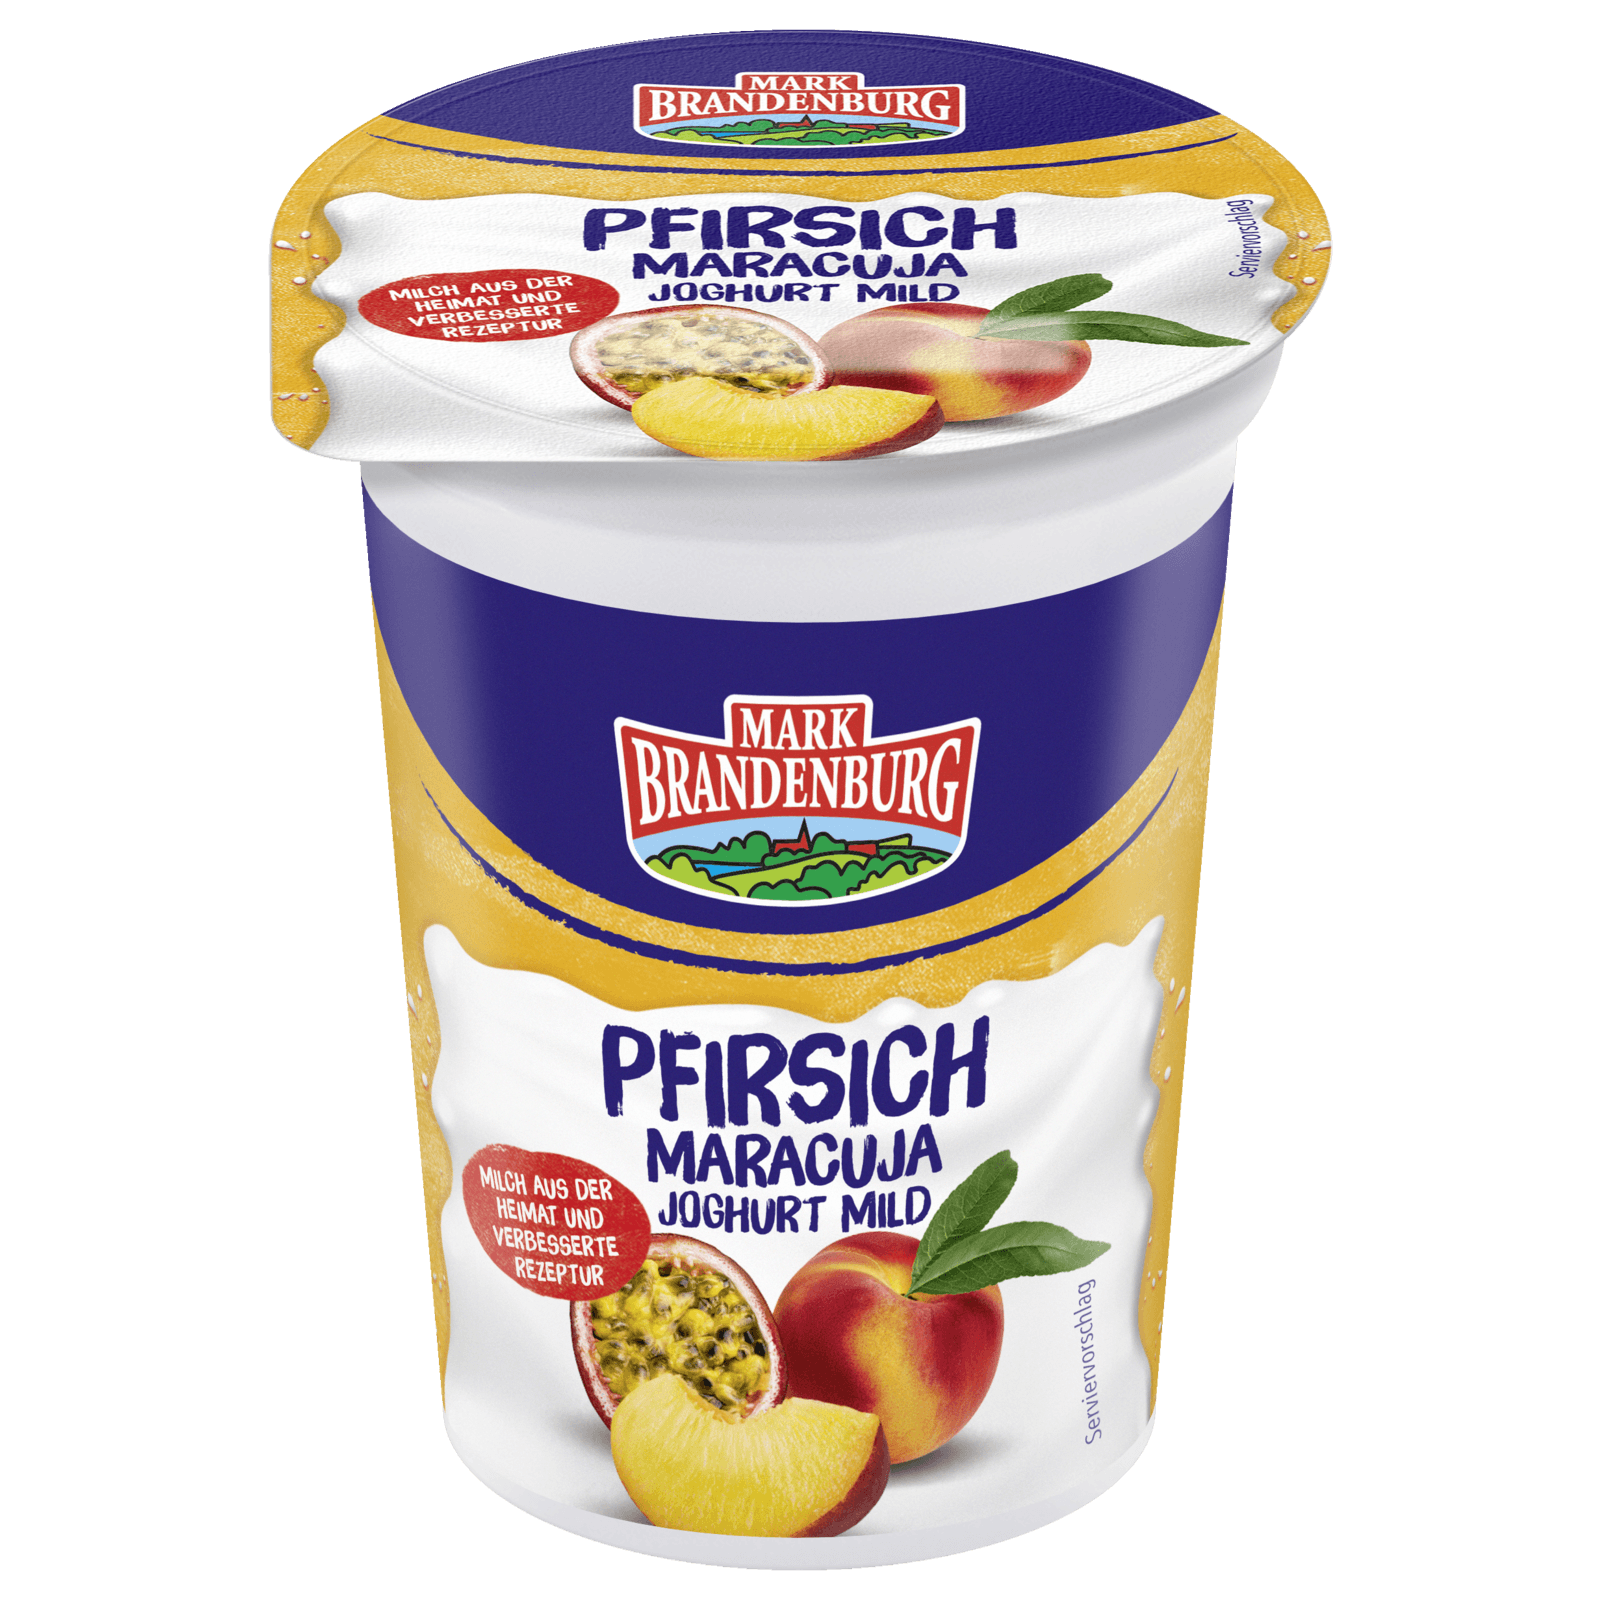 Mark Brandenburg Fruchtjoghurt Pfirsich-Maracuja 200g